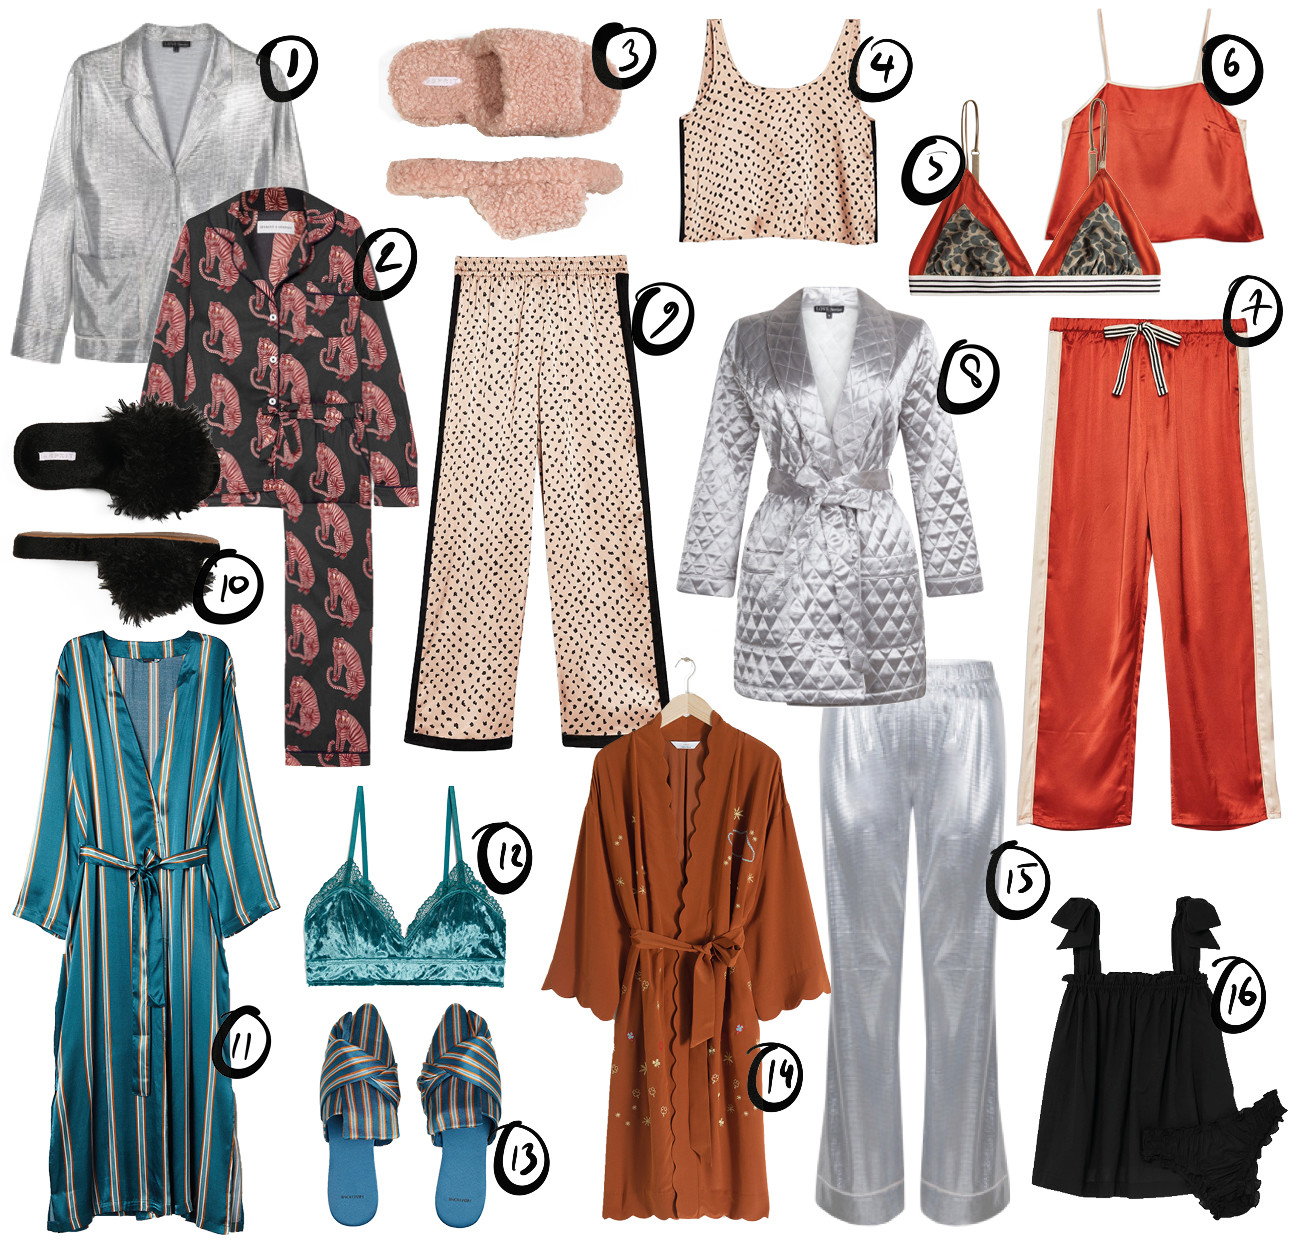 Pyjama shopping